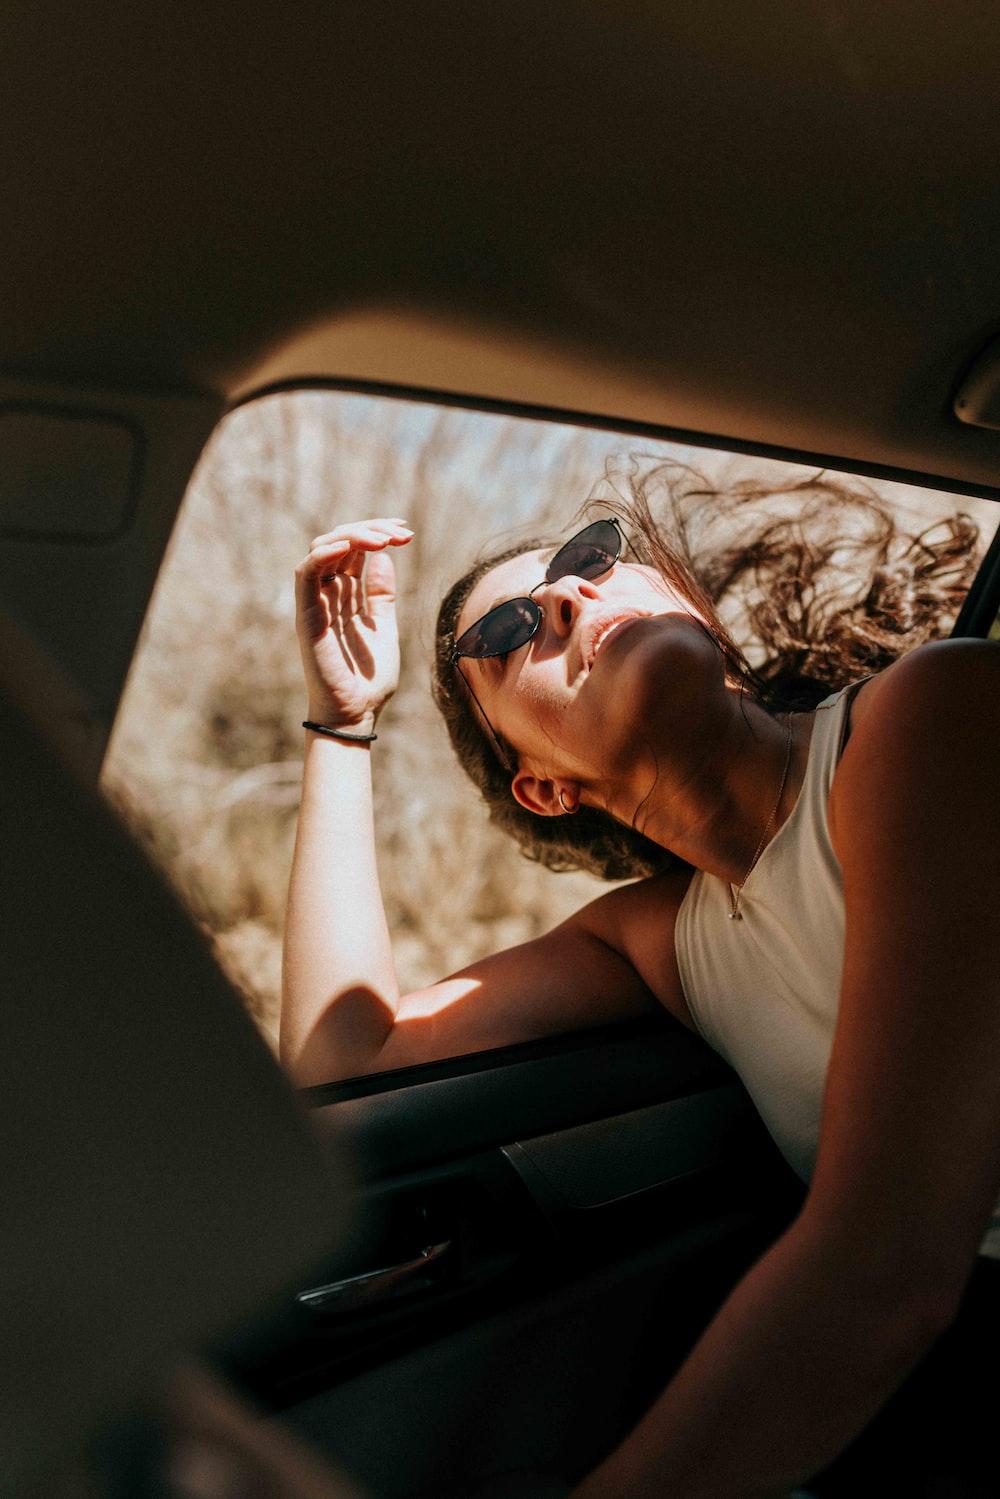 woman in white tank top wearing sunglasses sitting inside car